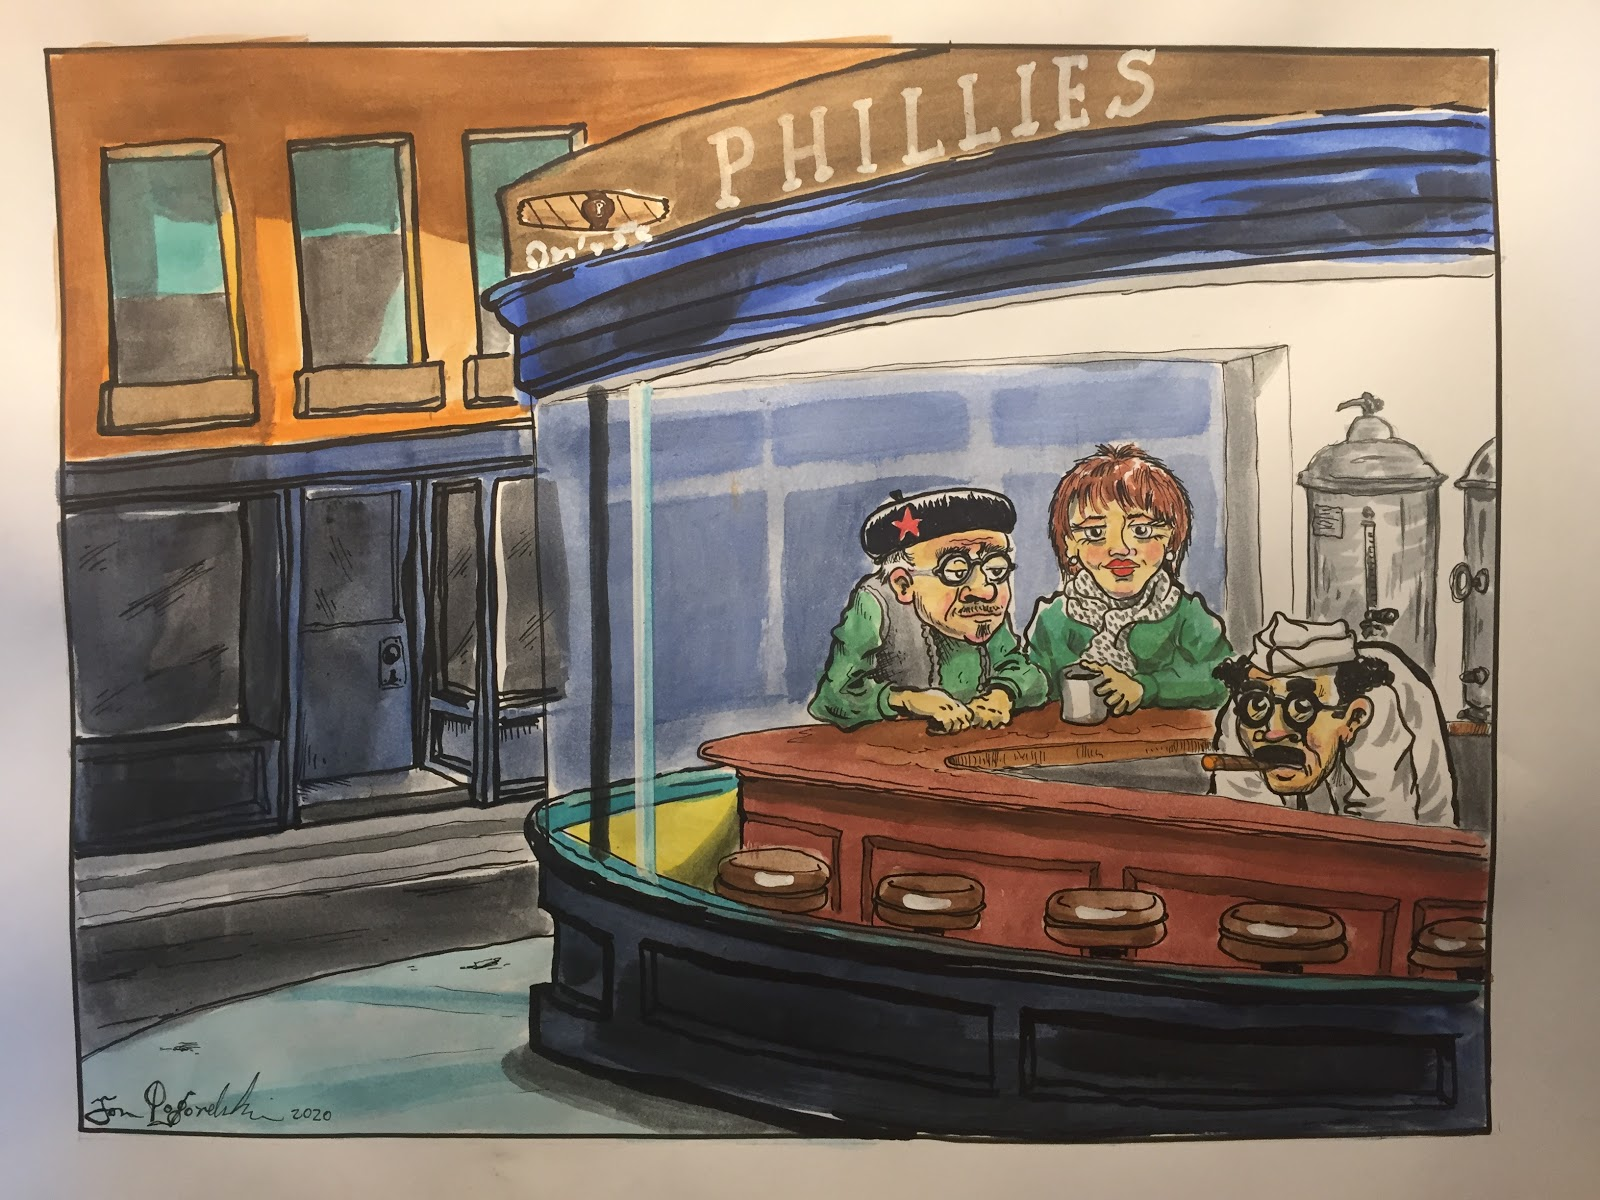 Jon Pogorelskin Phillies